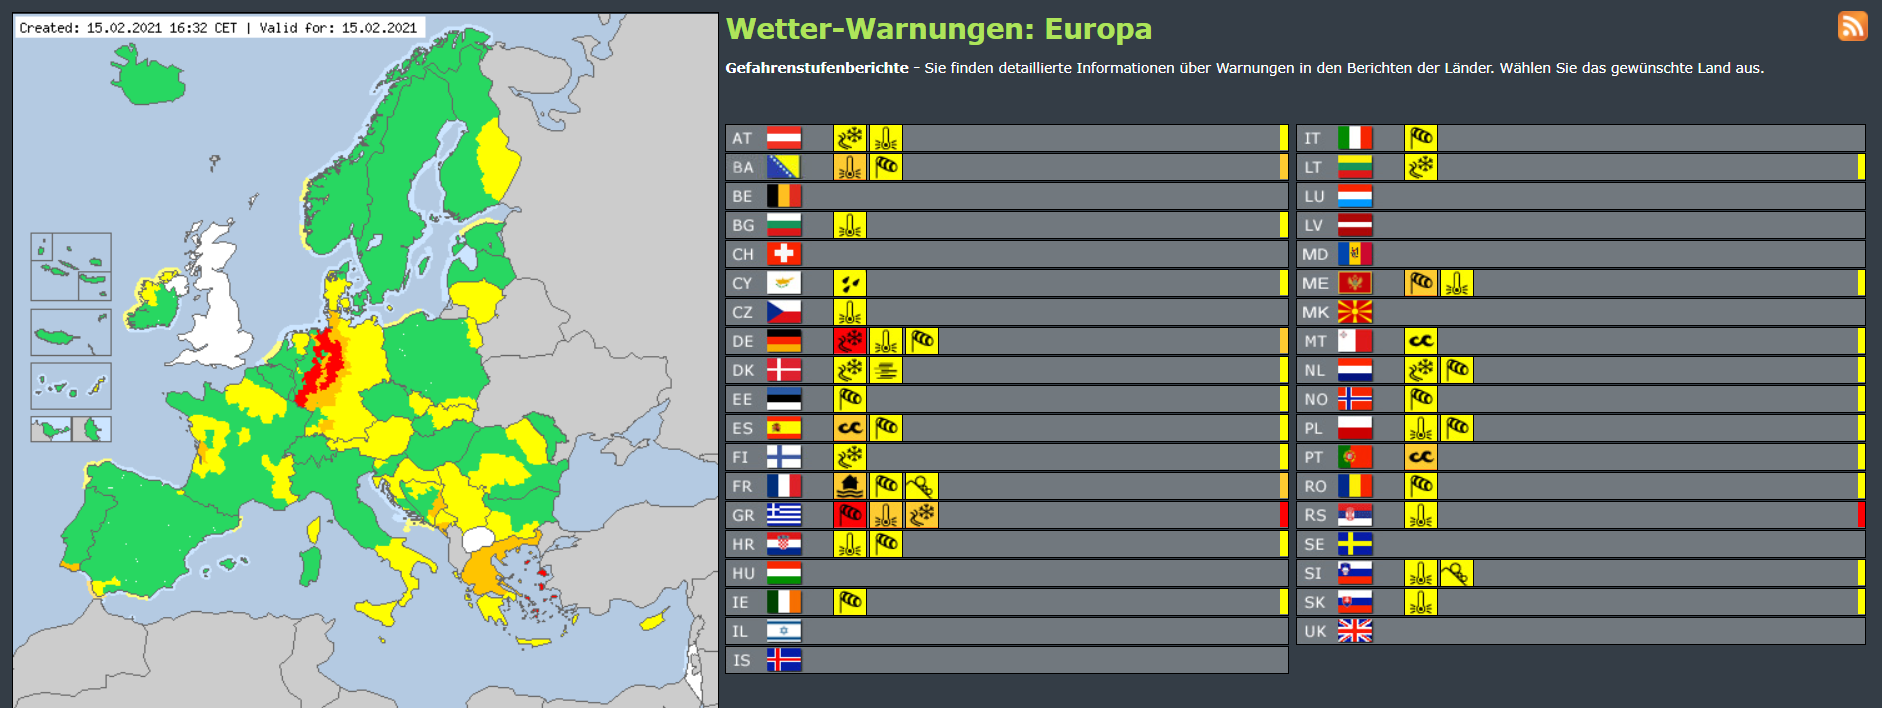 Meteoalarm weather warnings, 15 February 2015